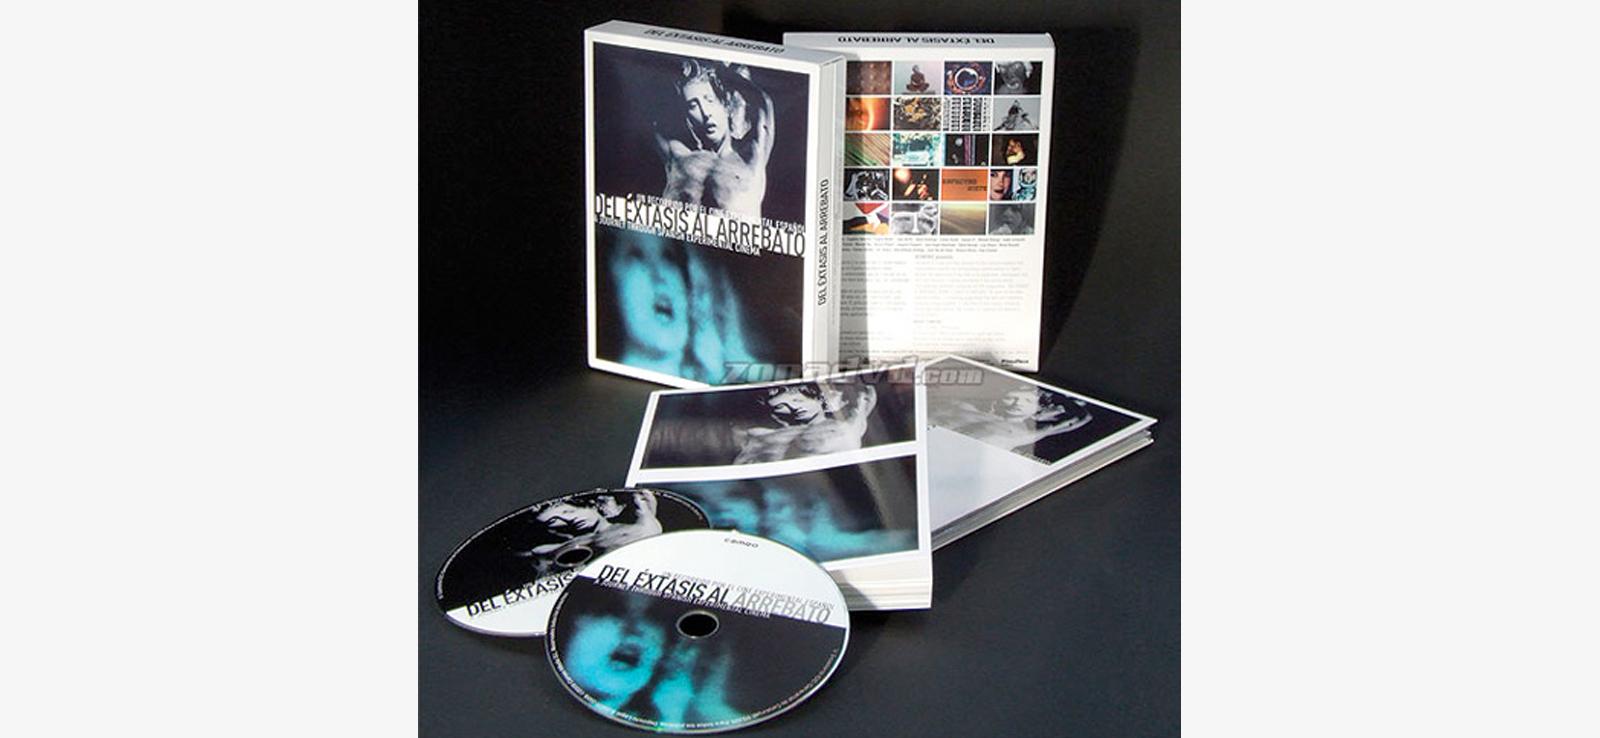 antoni-pinent-curator-DEL-EXTASIS-AL-ARREBATO-FROM-ECSTASY-TO-RAPTURE-Spanish-Film-CCCB-dvd